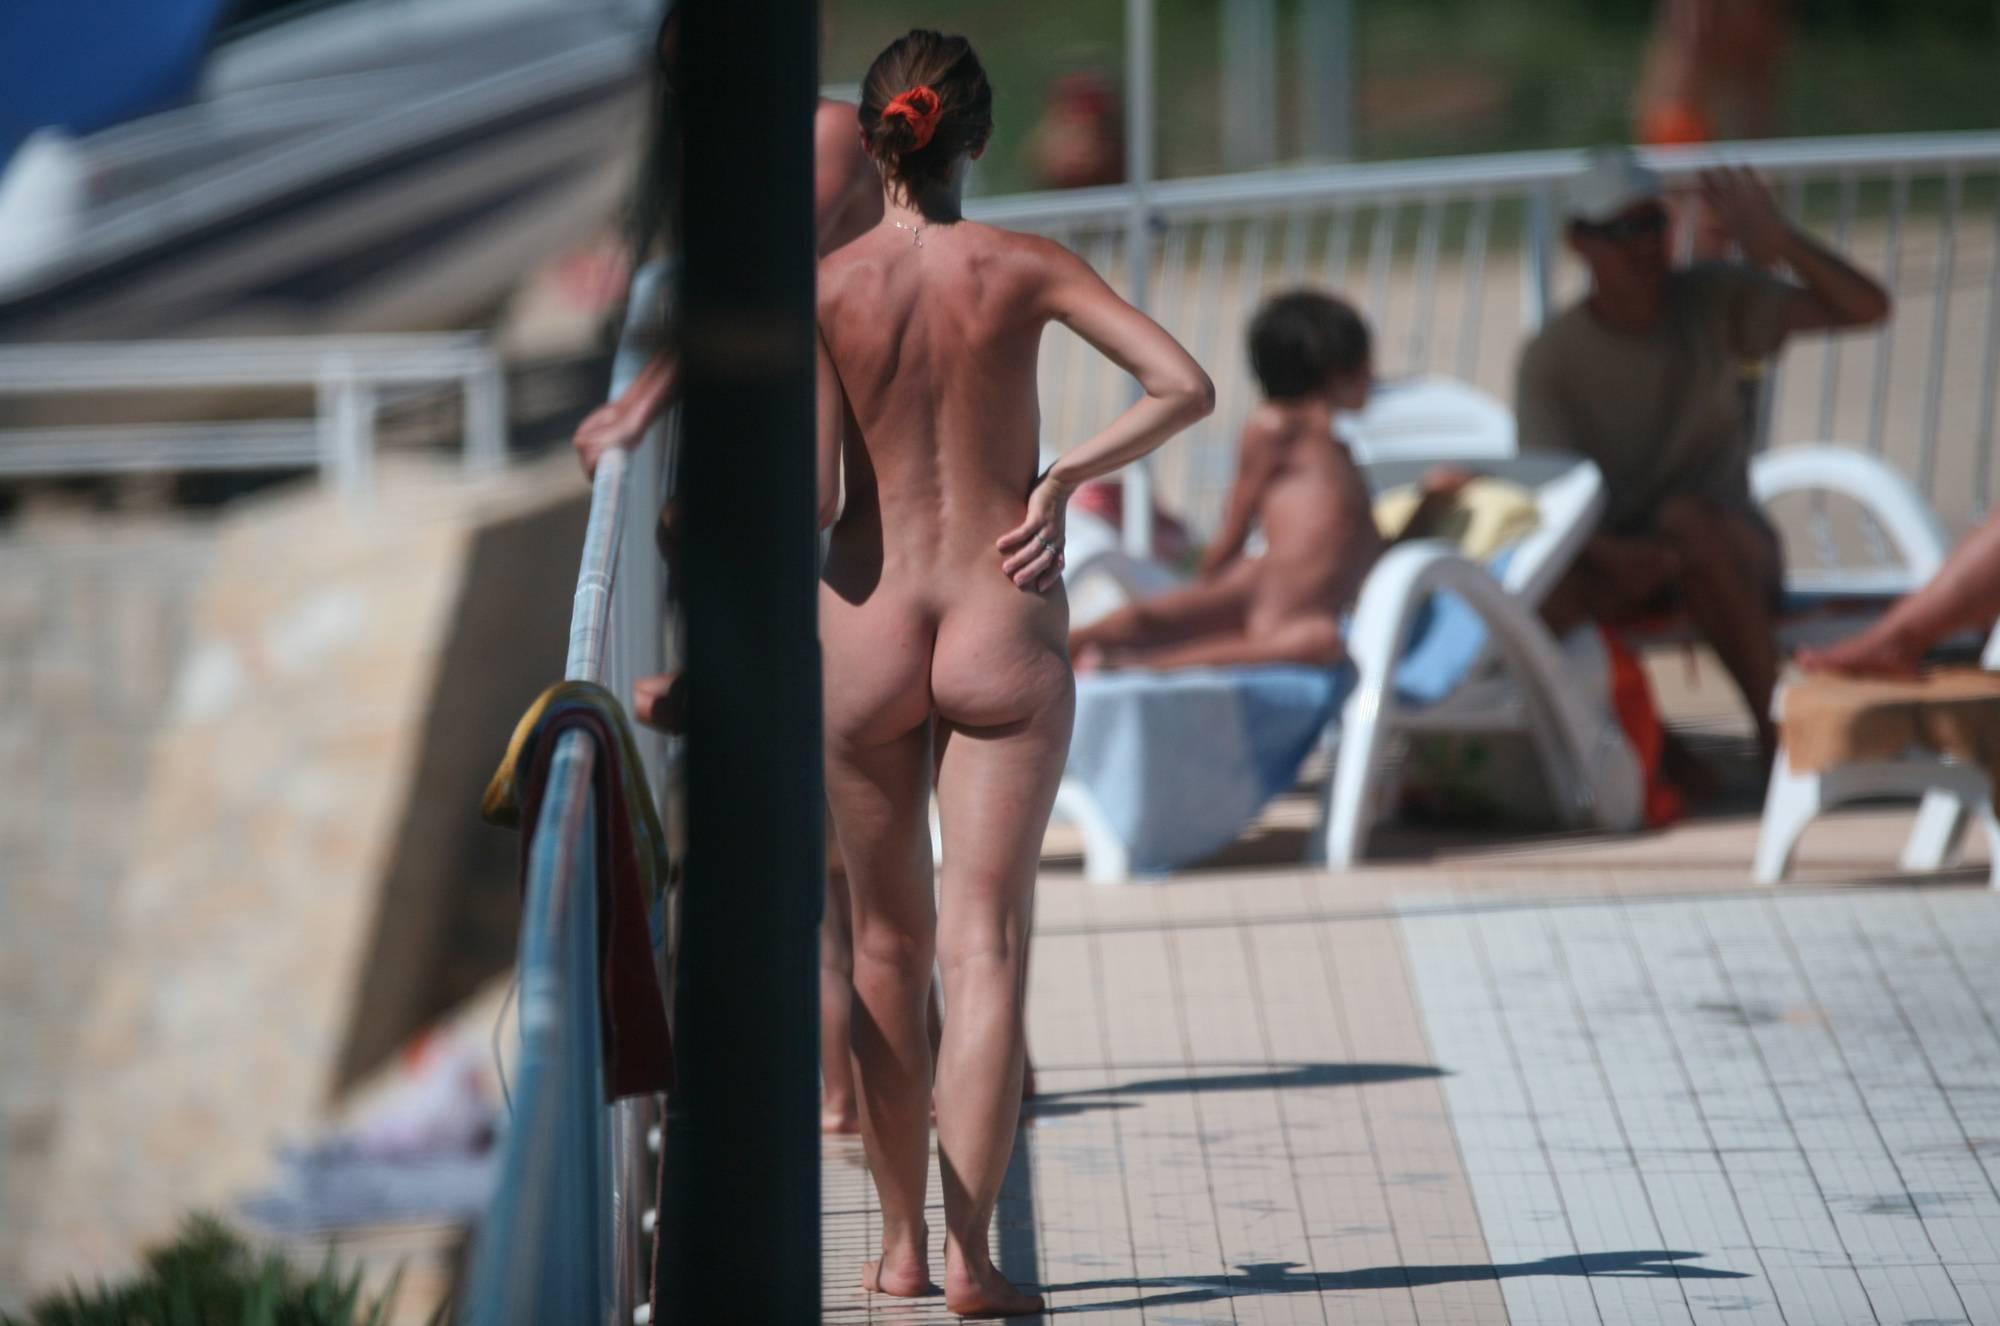 Nudist Pool Walk Around - 2